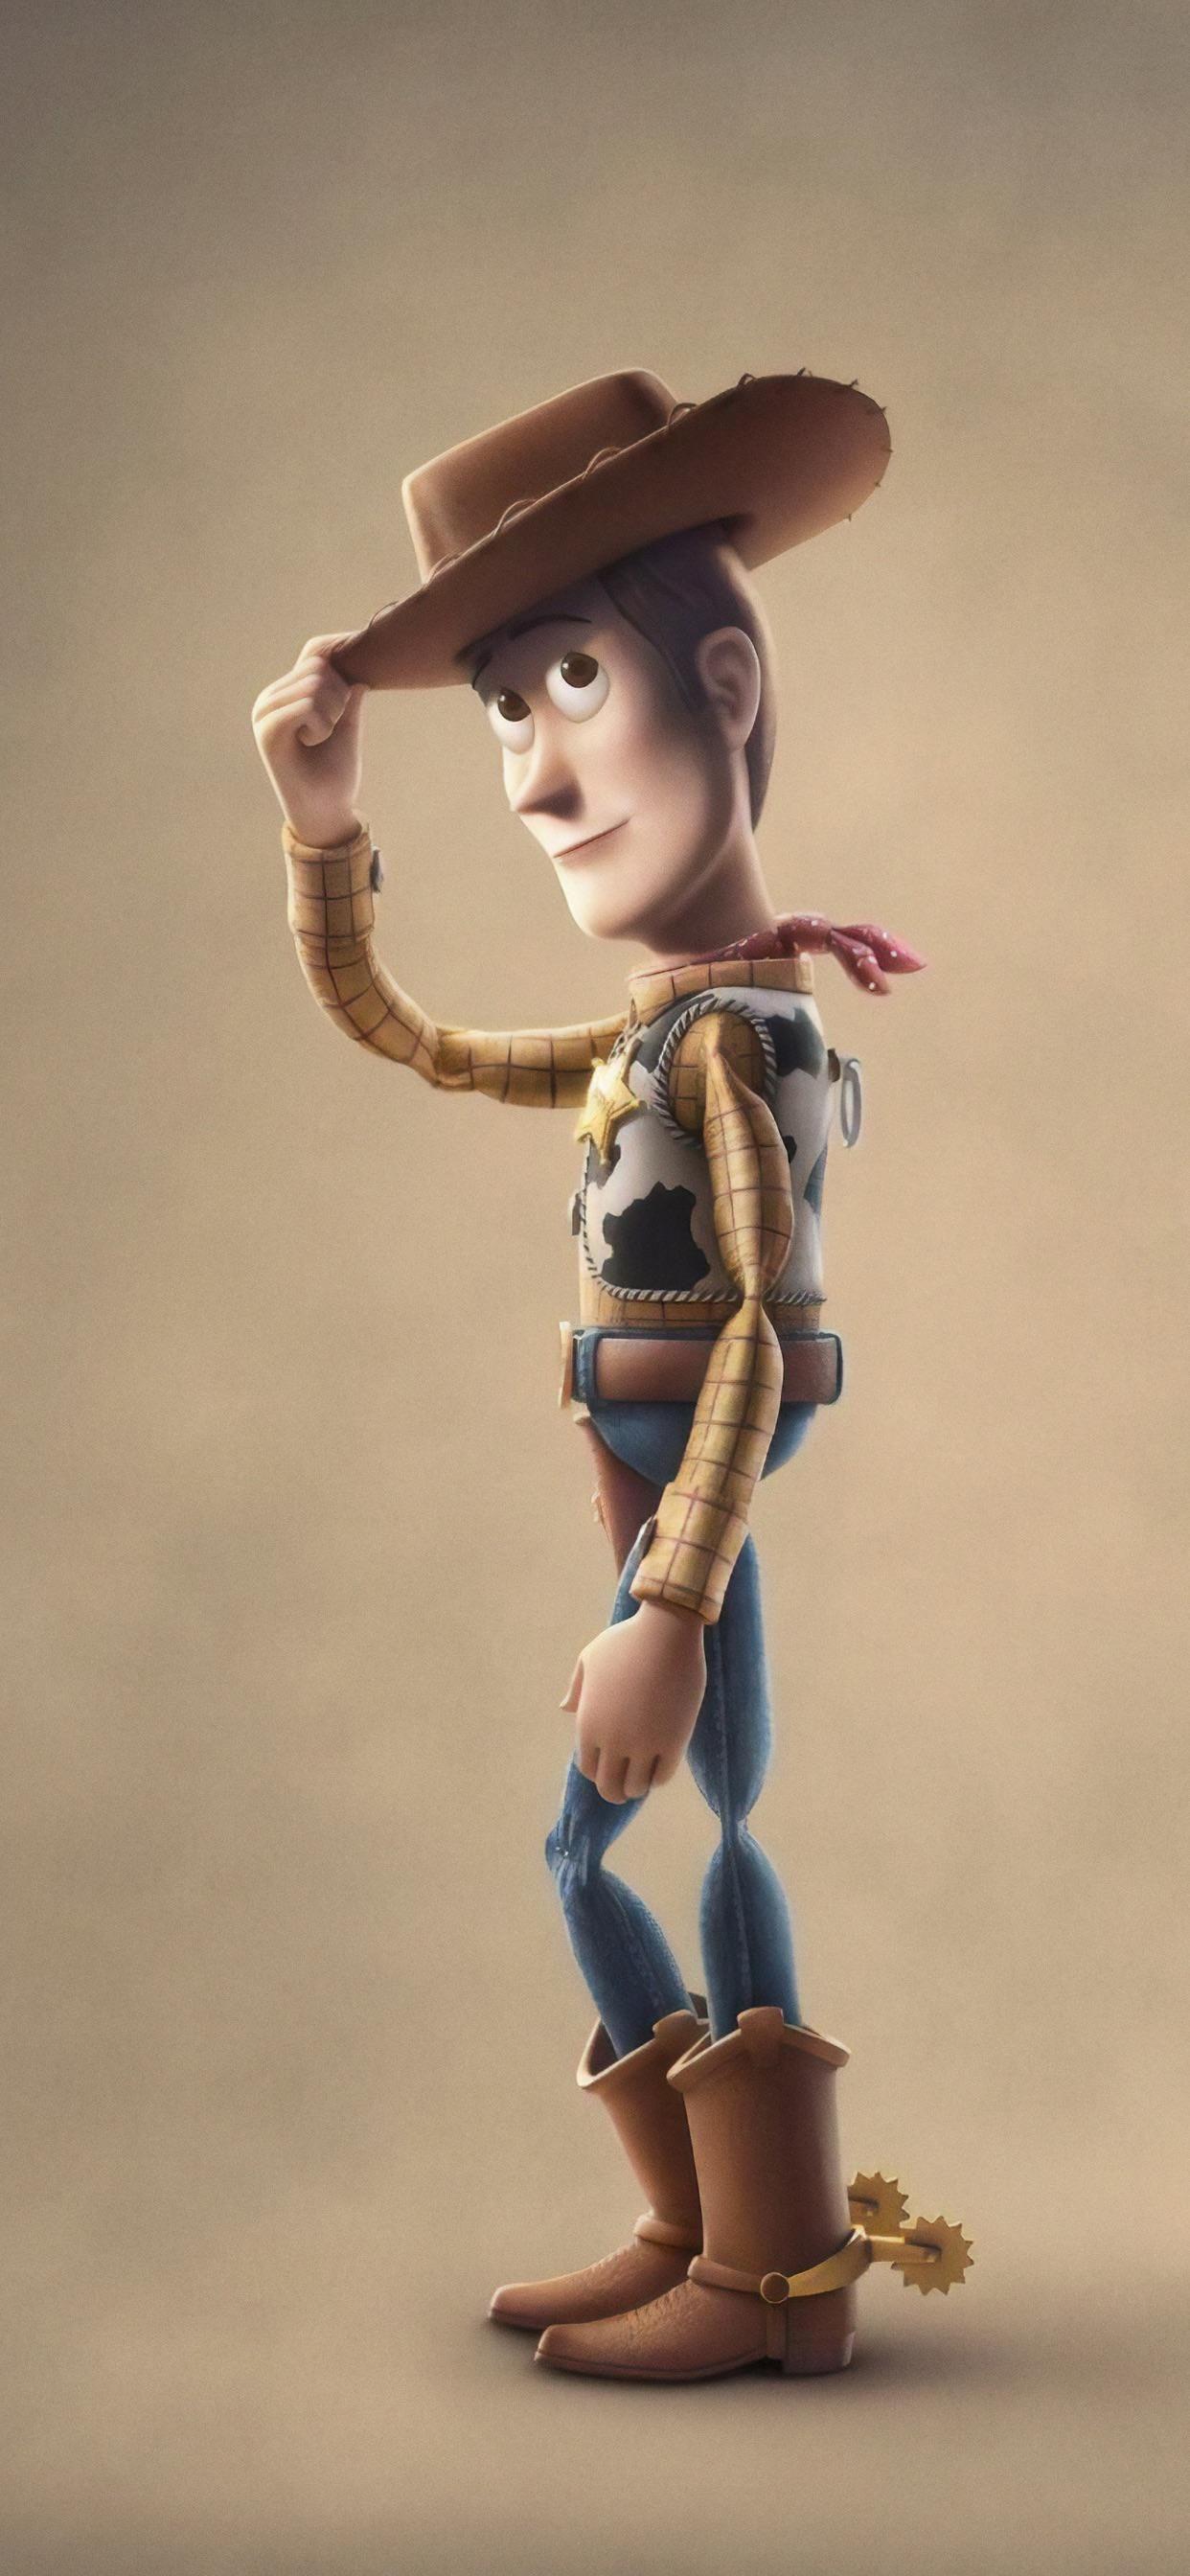 Hi Woody Wallpaper Iphone Disney Woody Toy Story Cartoon Wallpaper Hd